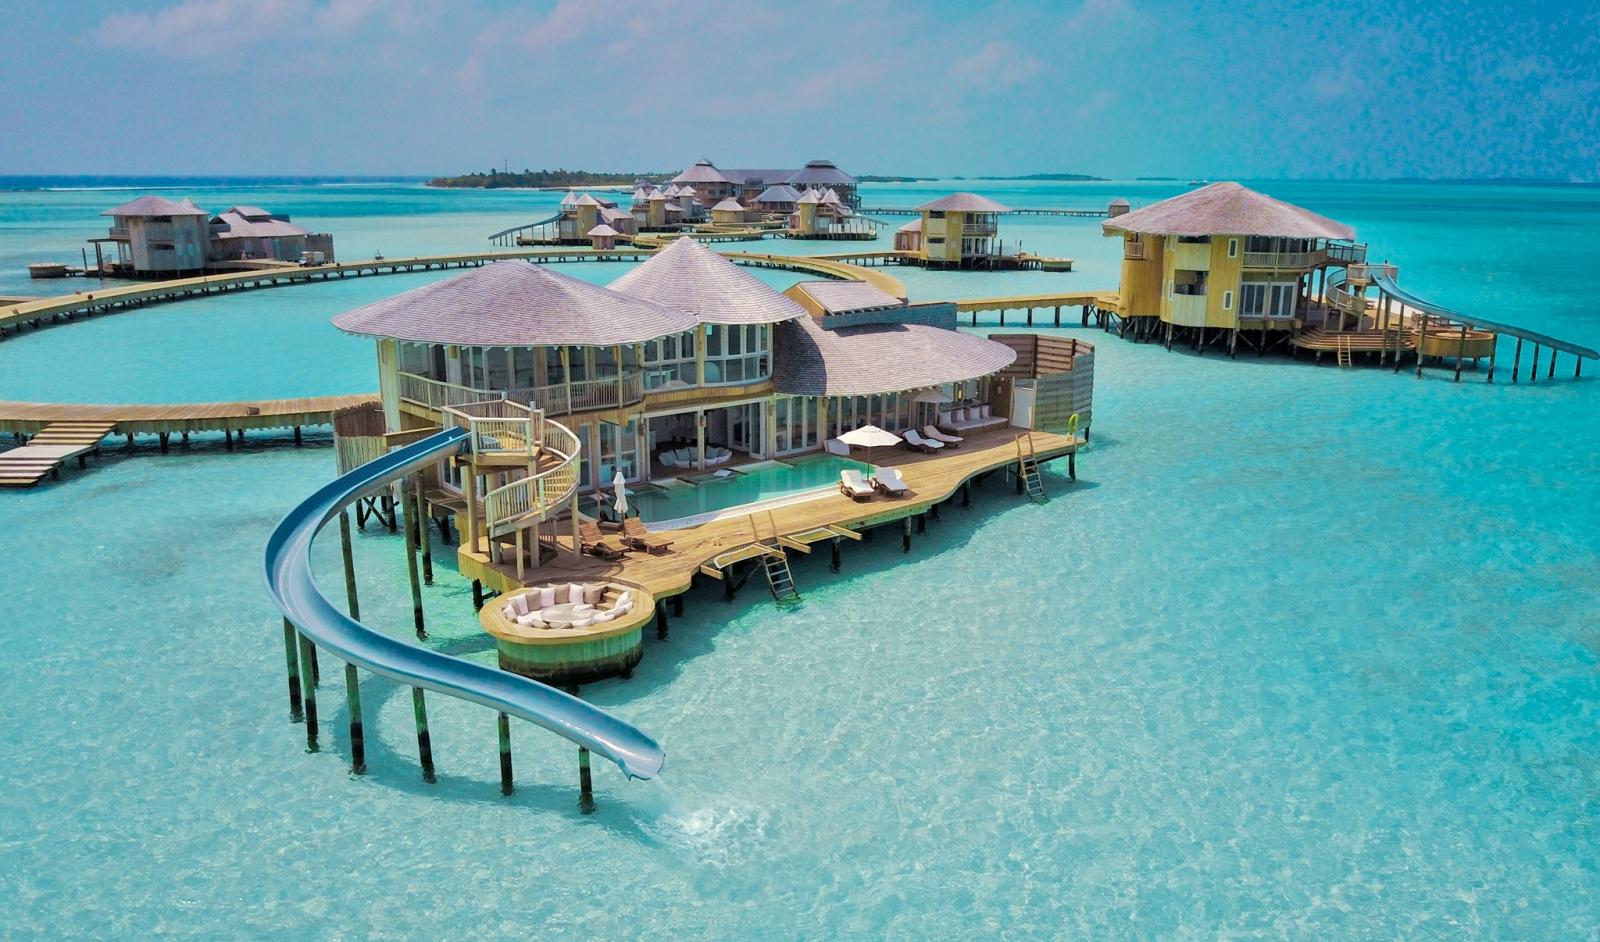 Du lịch Maldives - Tham quan những resort nổi tiếng ở Maldives